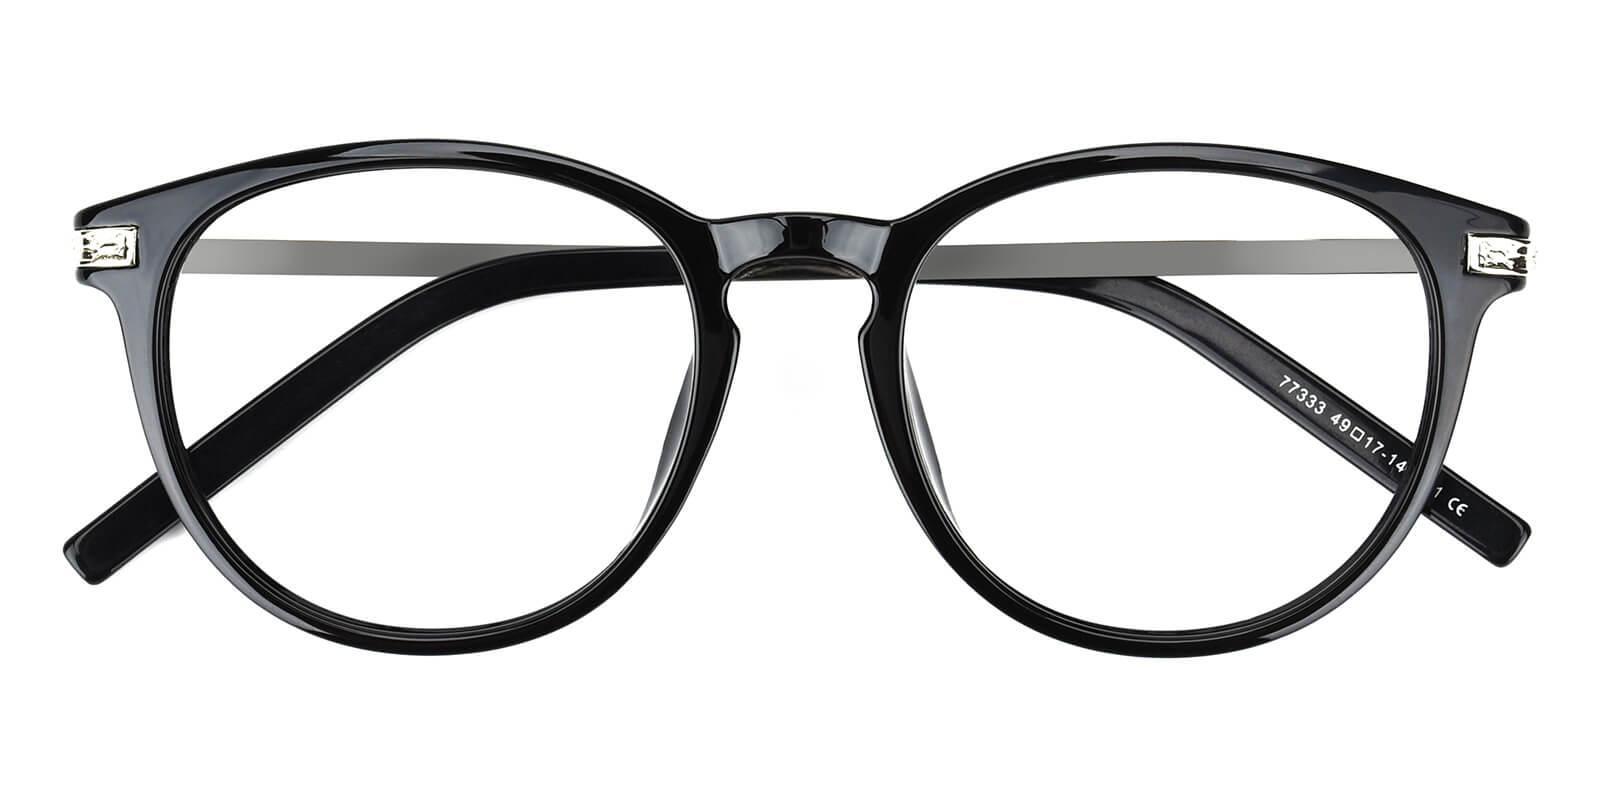 Gambia-Black-Round-Combination-Eyeglasses-detail